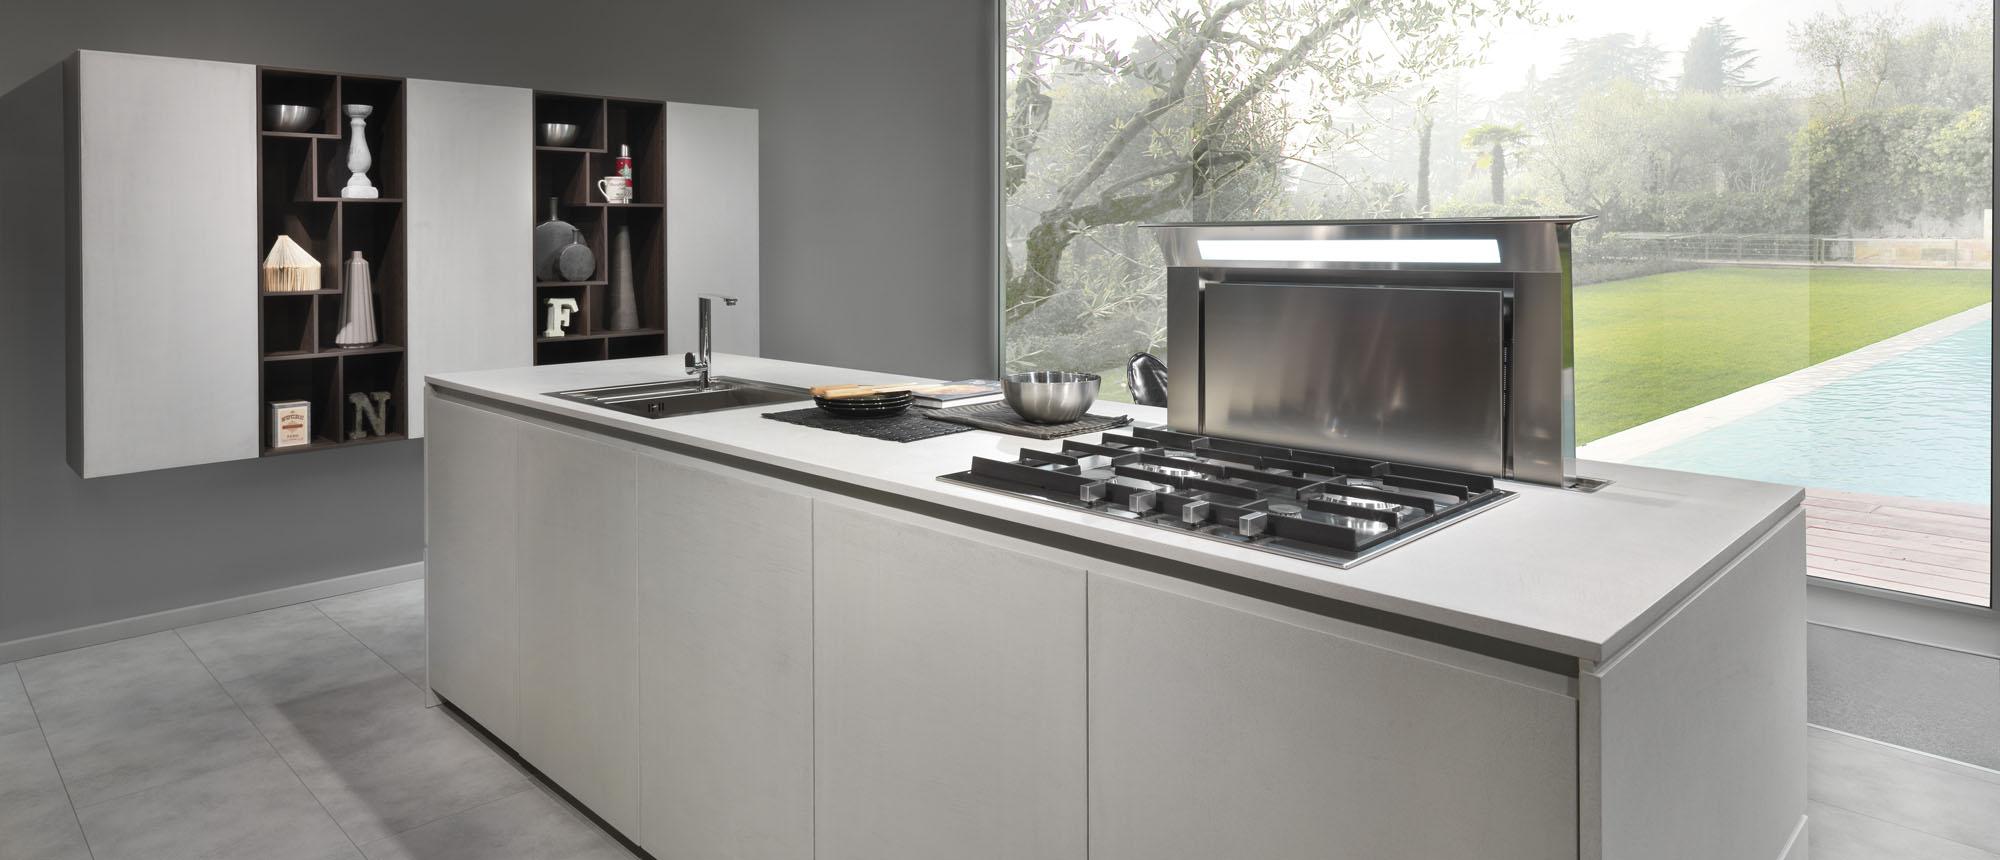 Cucine arredamenti treo for Castagna arredamenti